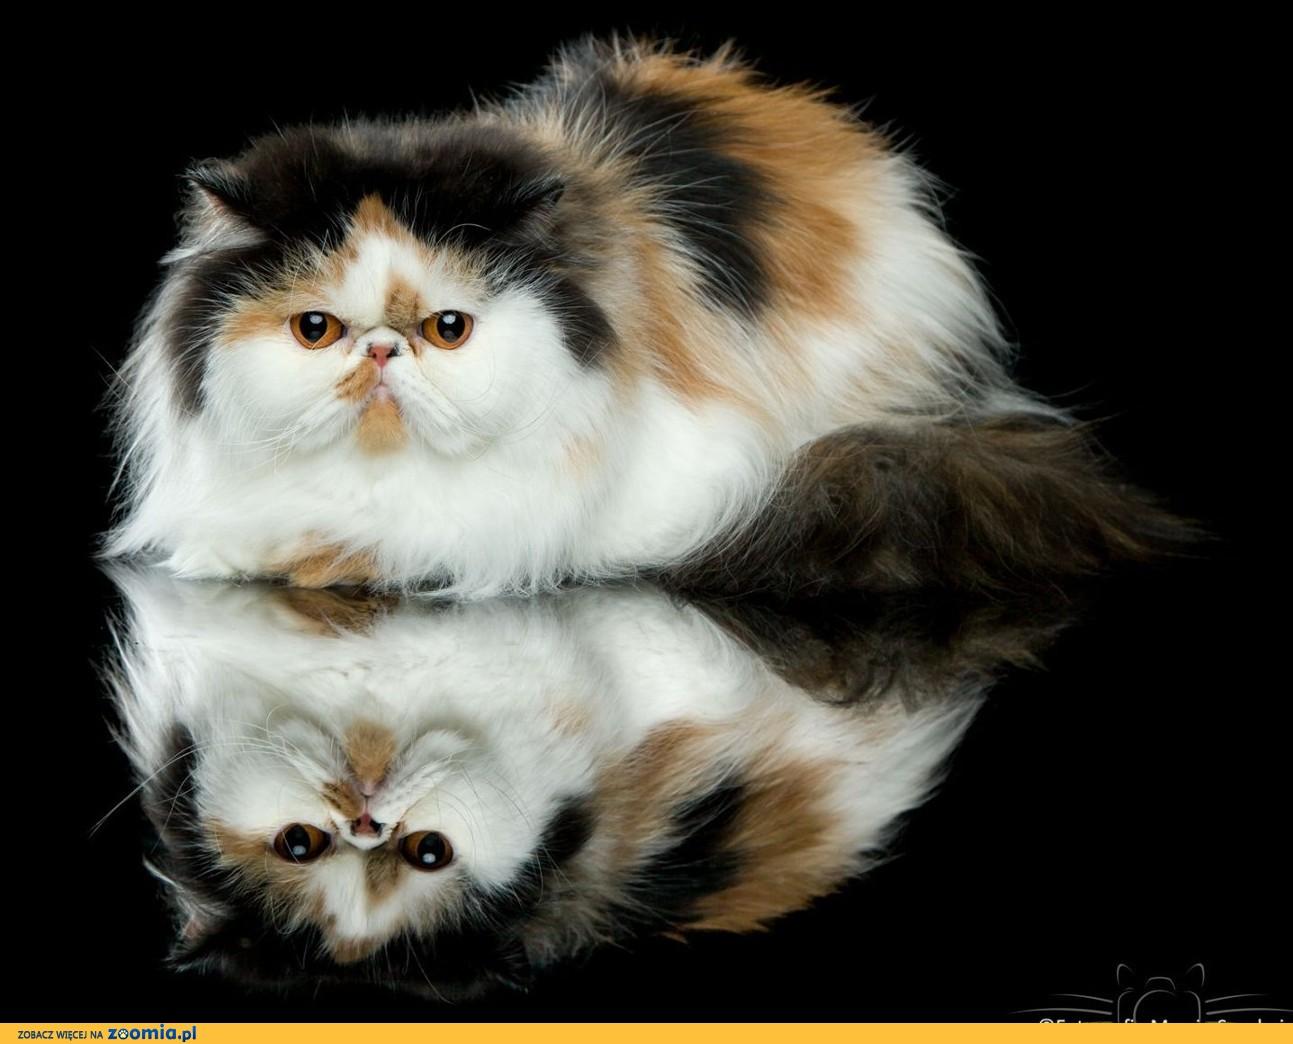 Kocięta rasy kot egzotyczny